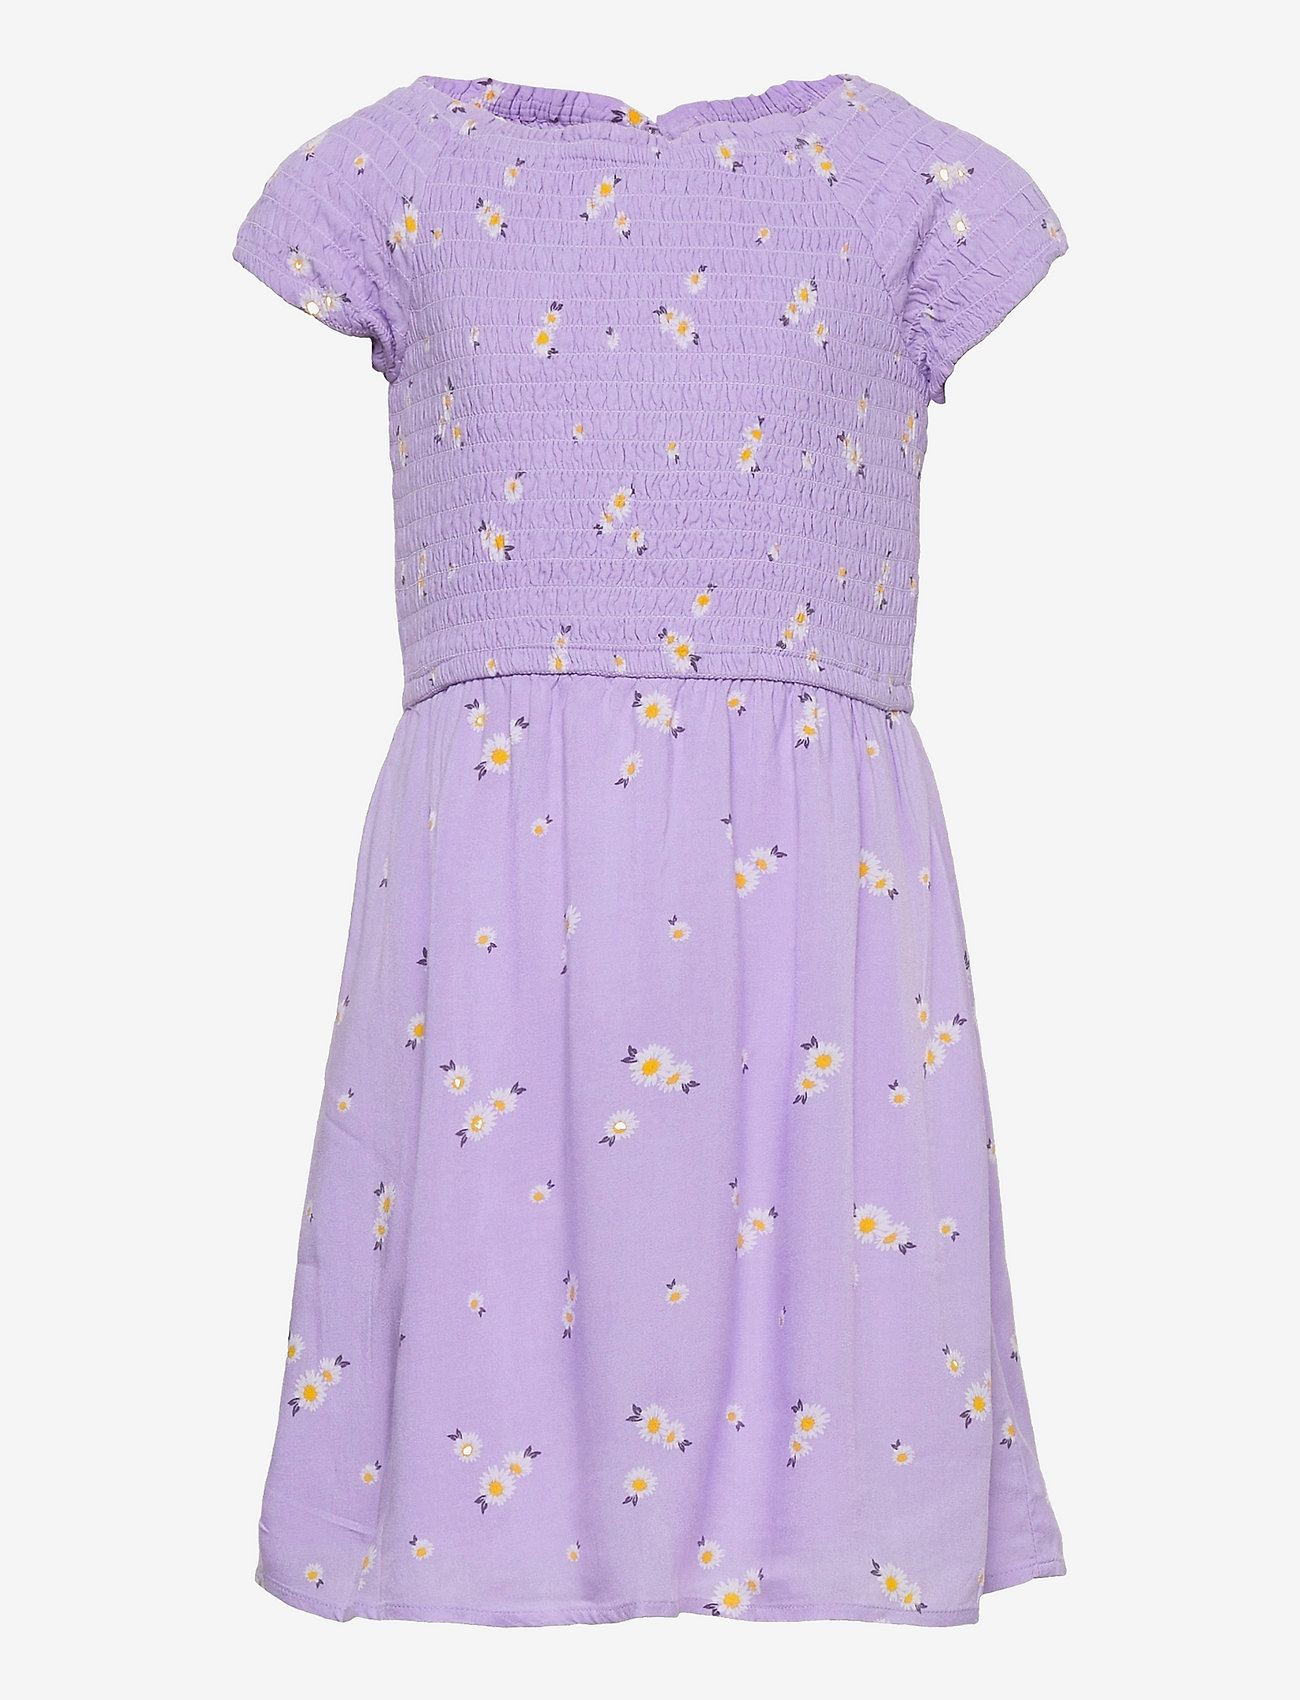 Abercrombie & Fitch - kids GIRLS DRESSES - kleider - light pink patter - 0